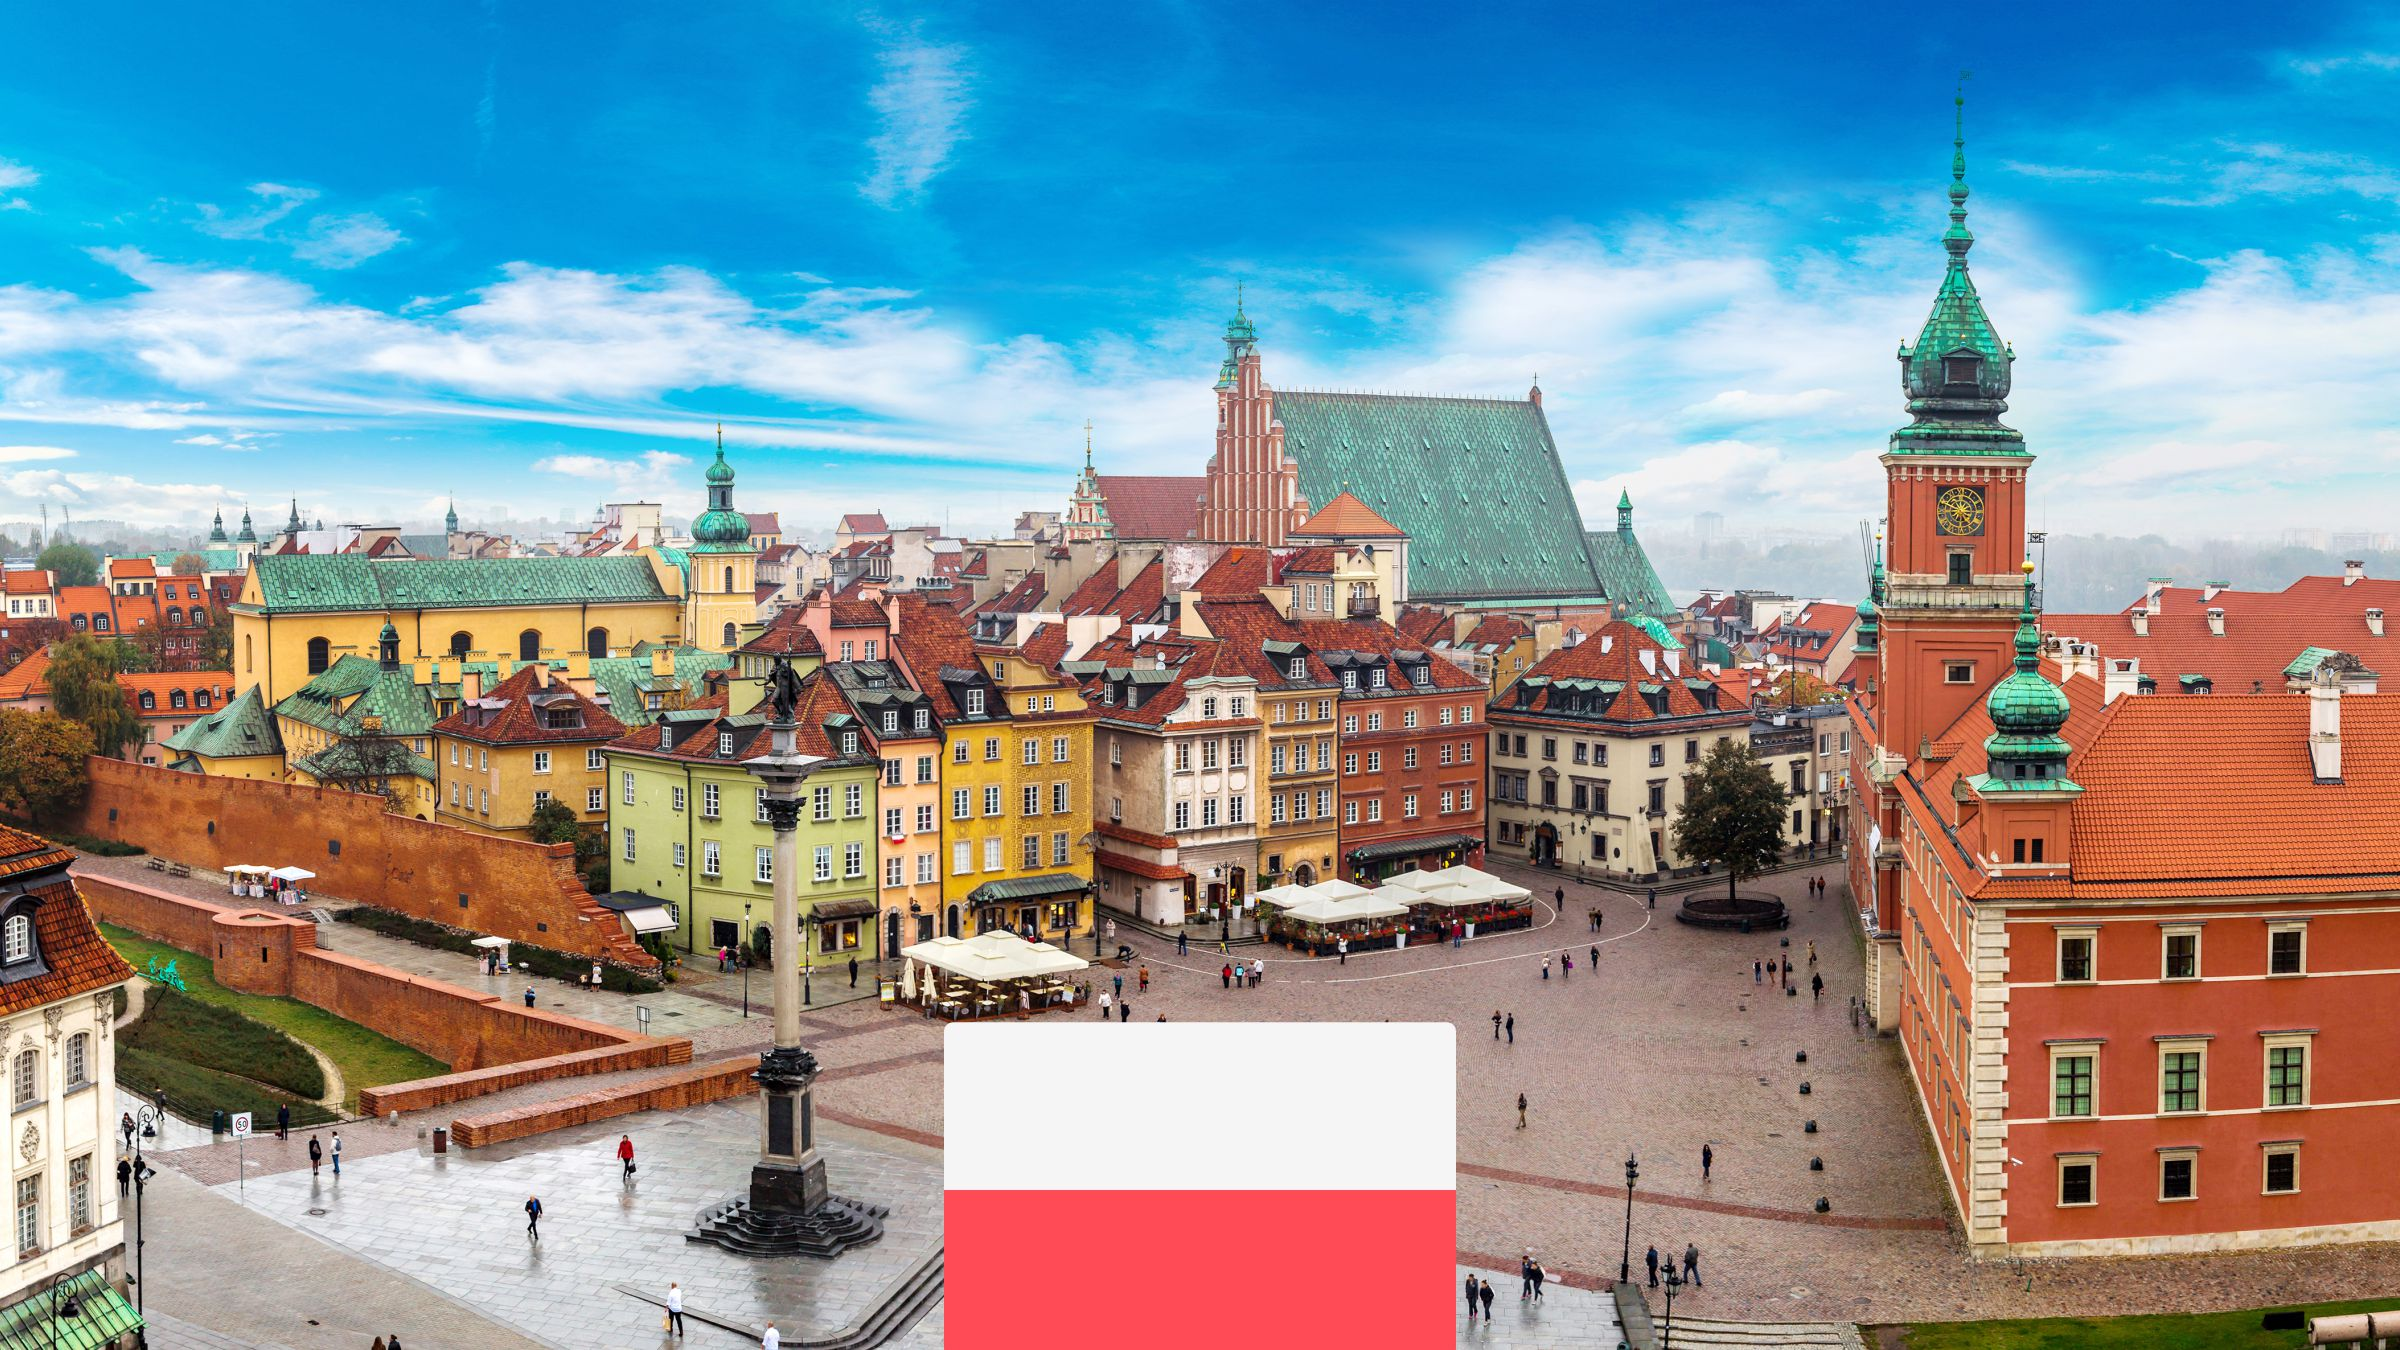 Varšava zPrahy od 756Kč: Romantický víkendový výlet až do jara 2022